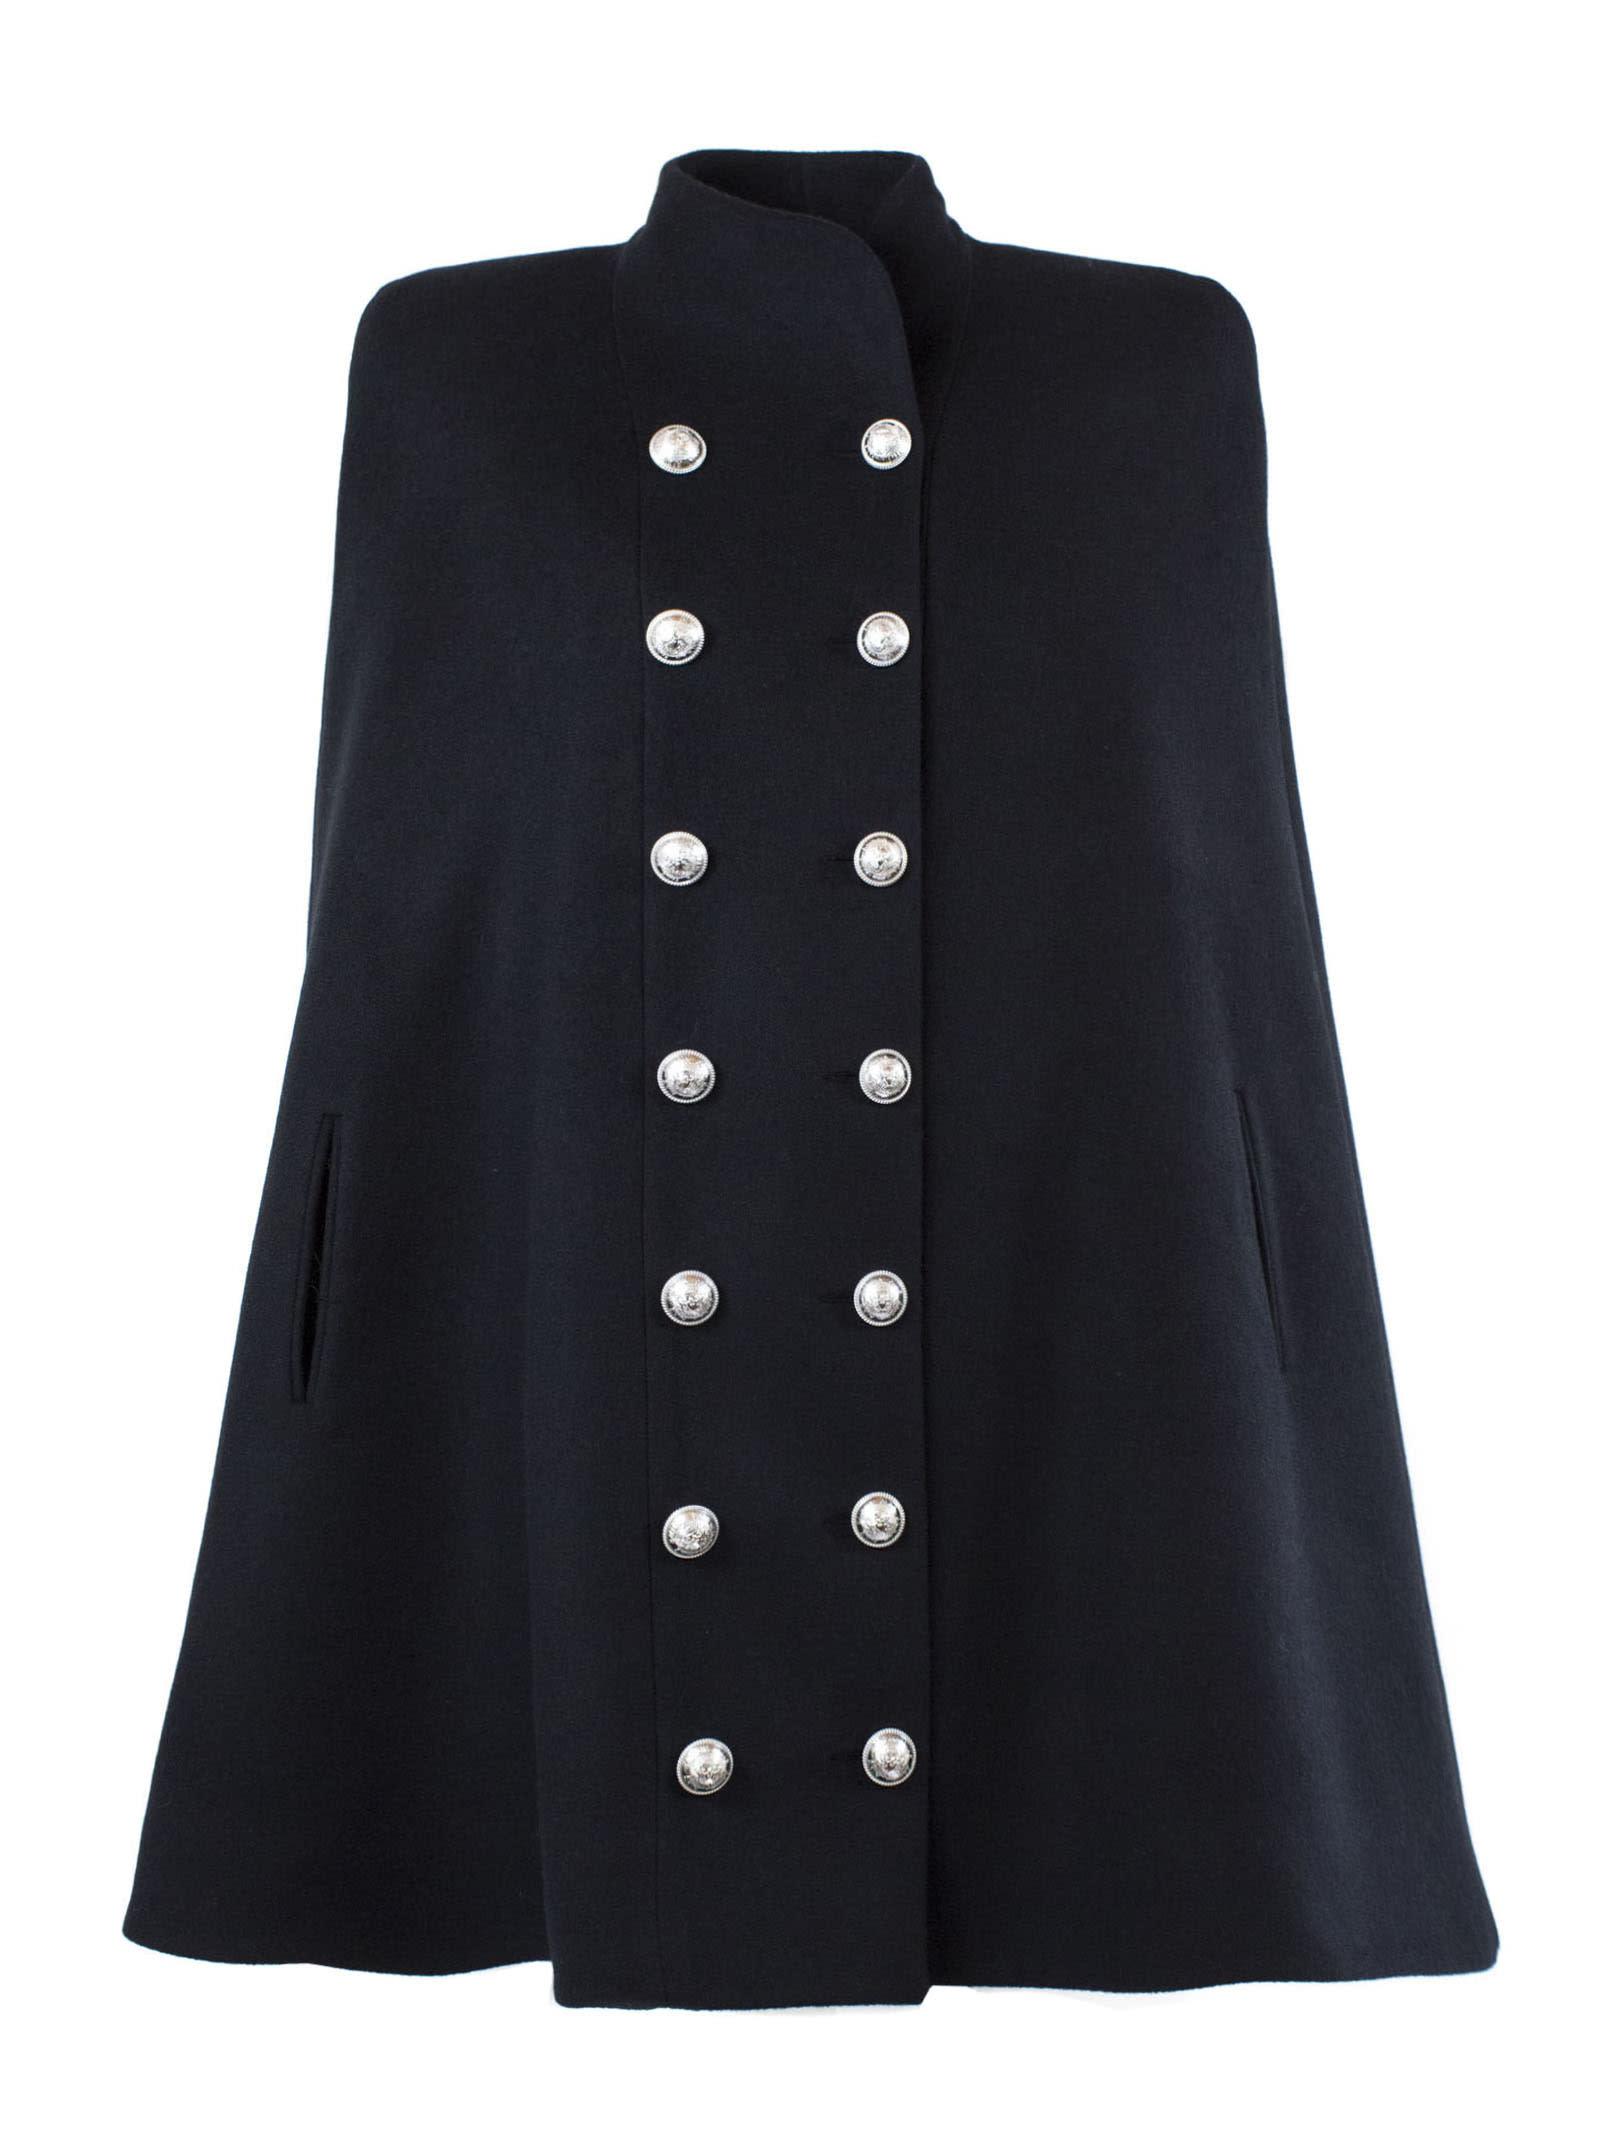 Balmain Black Wool Cape